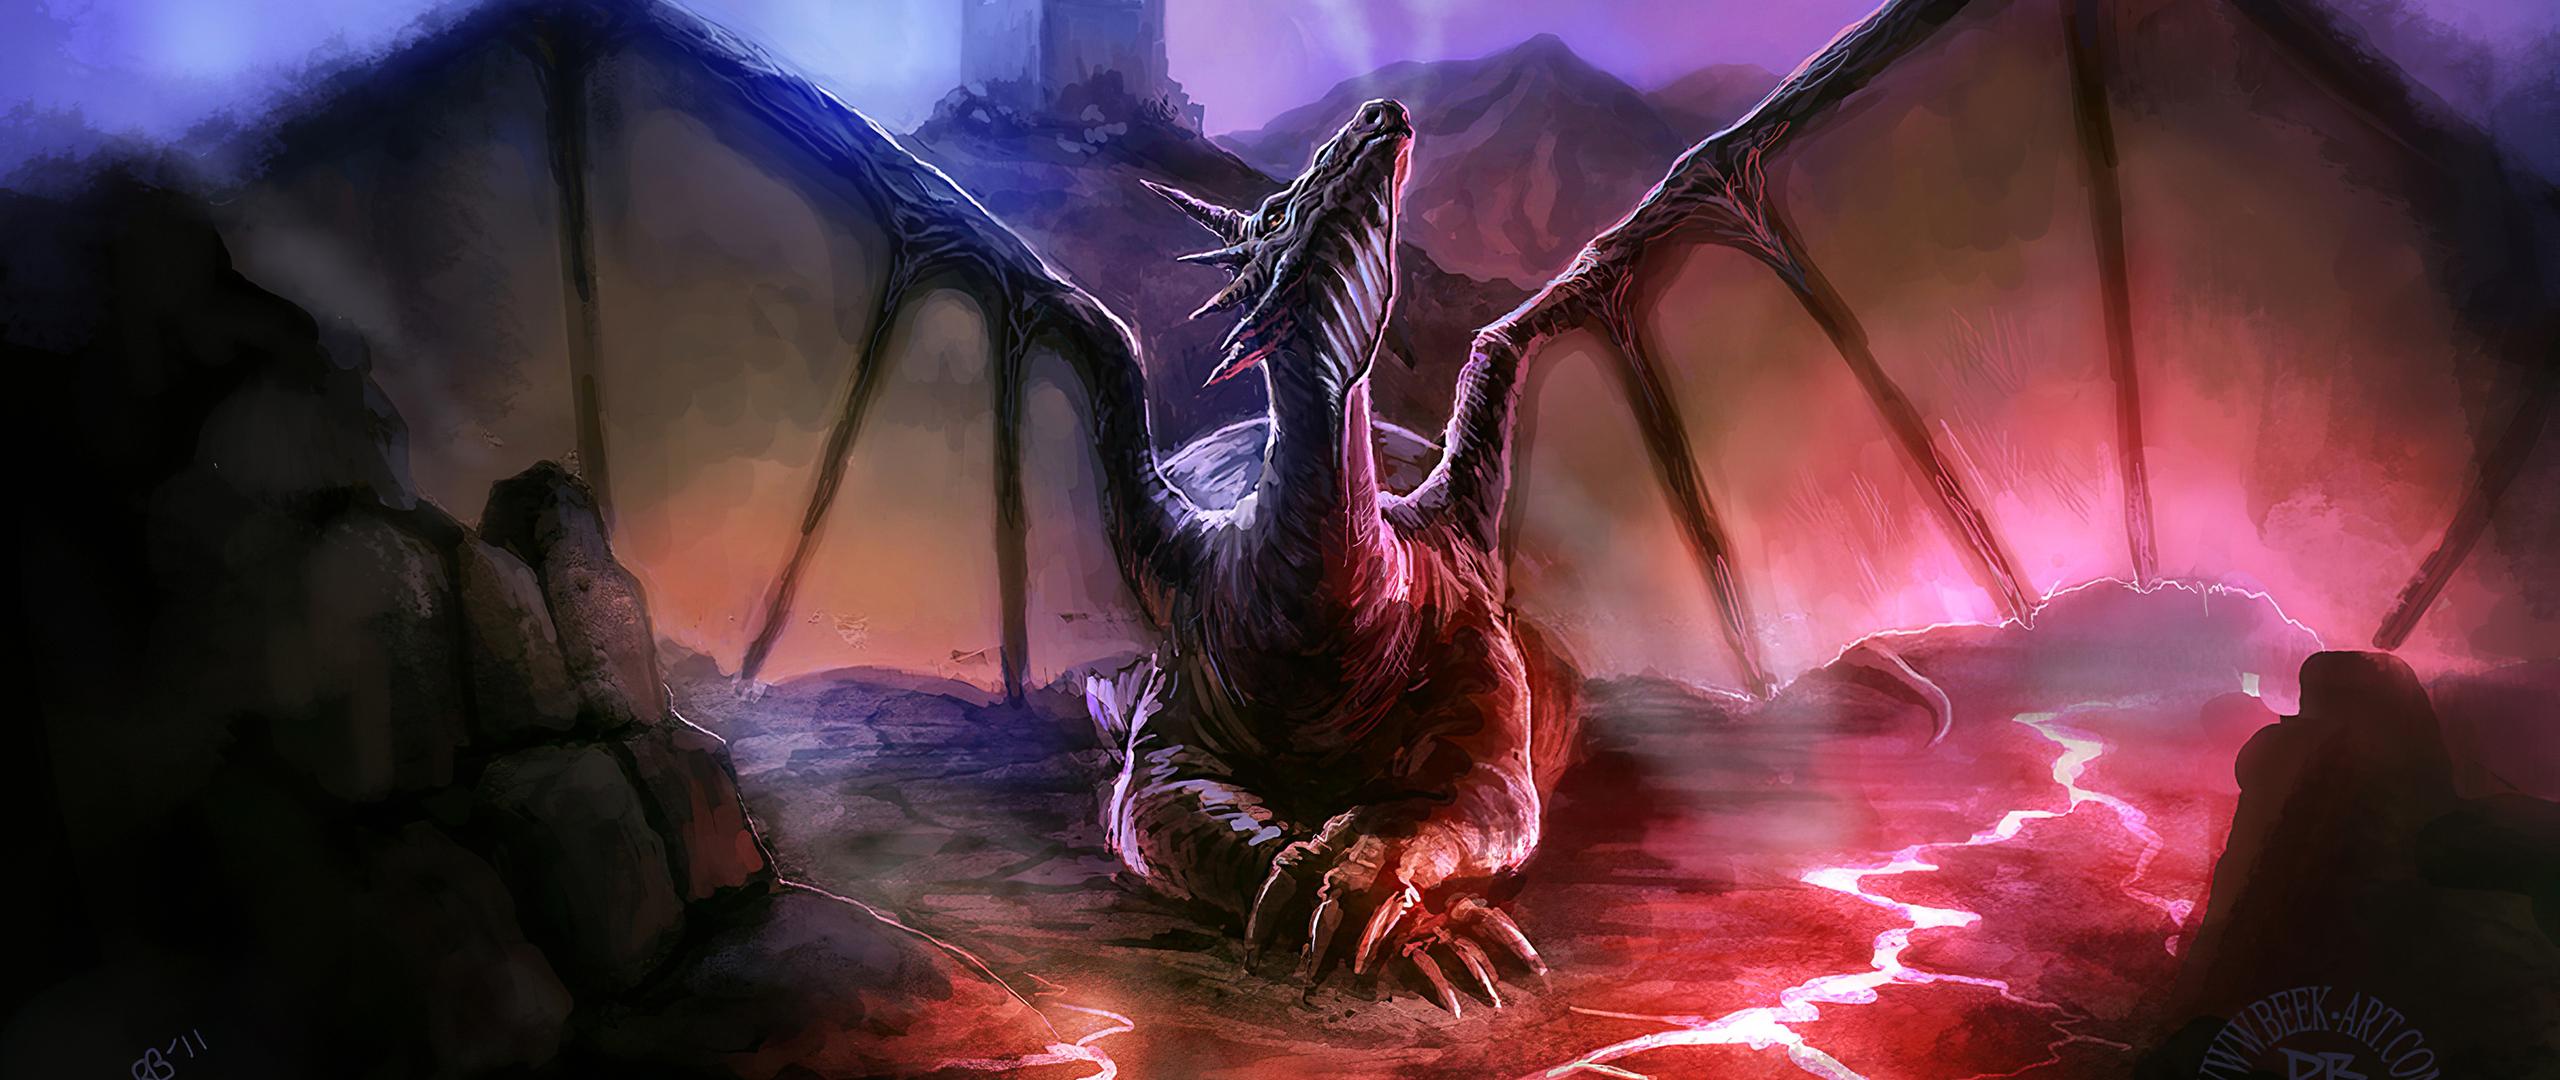 the-arogant-dragon-k6.jpg